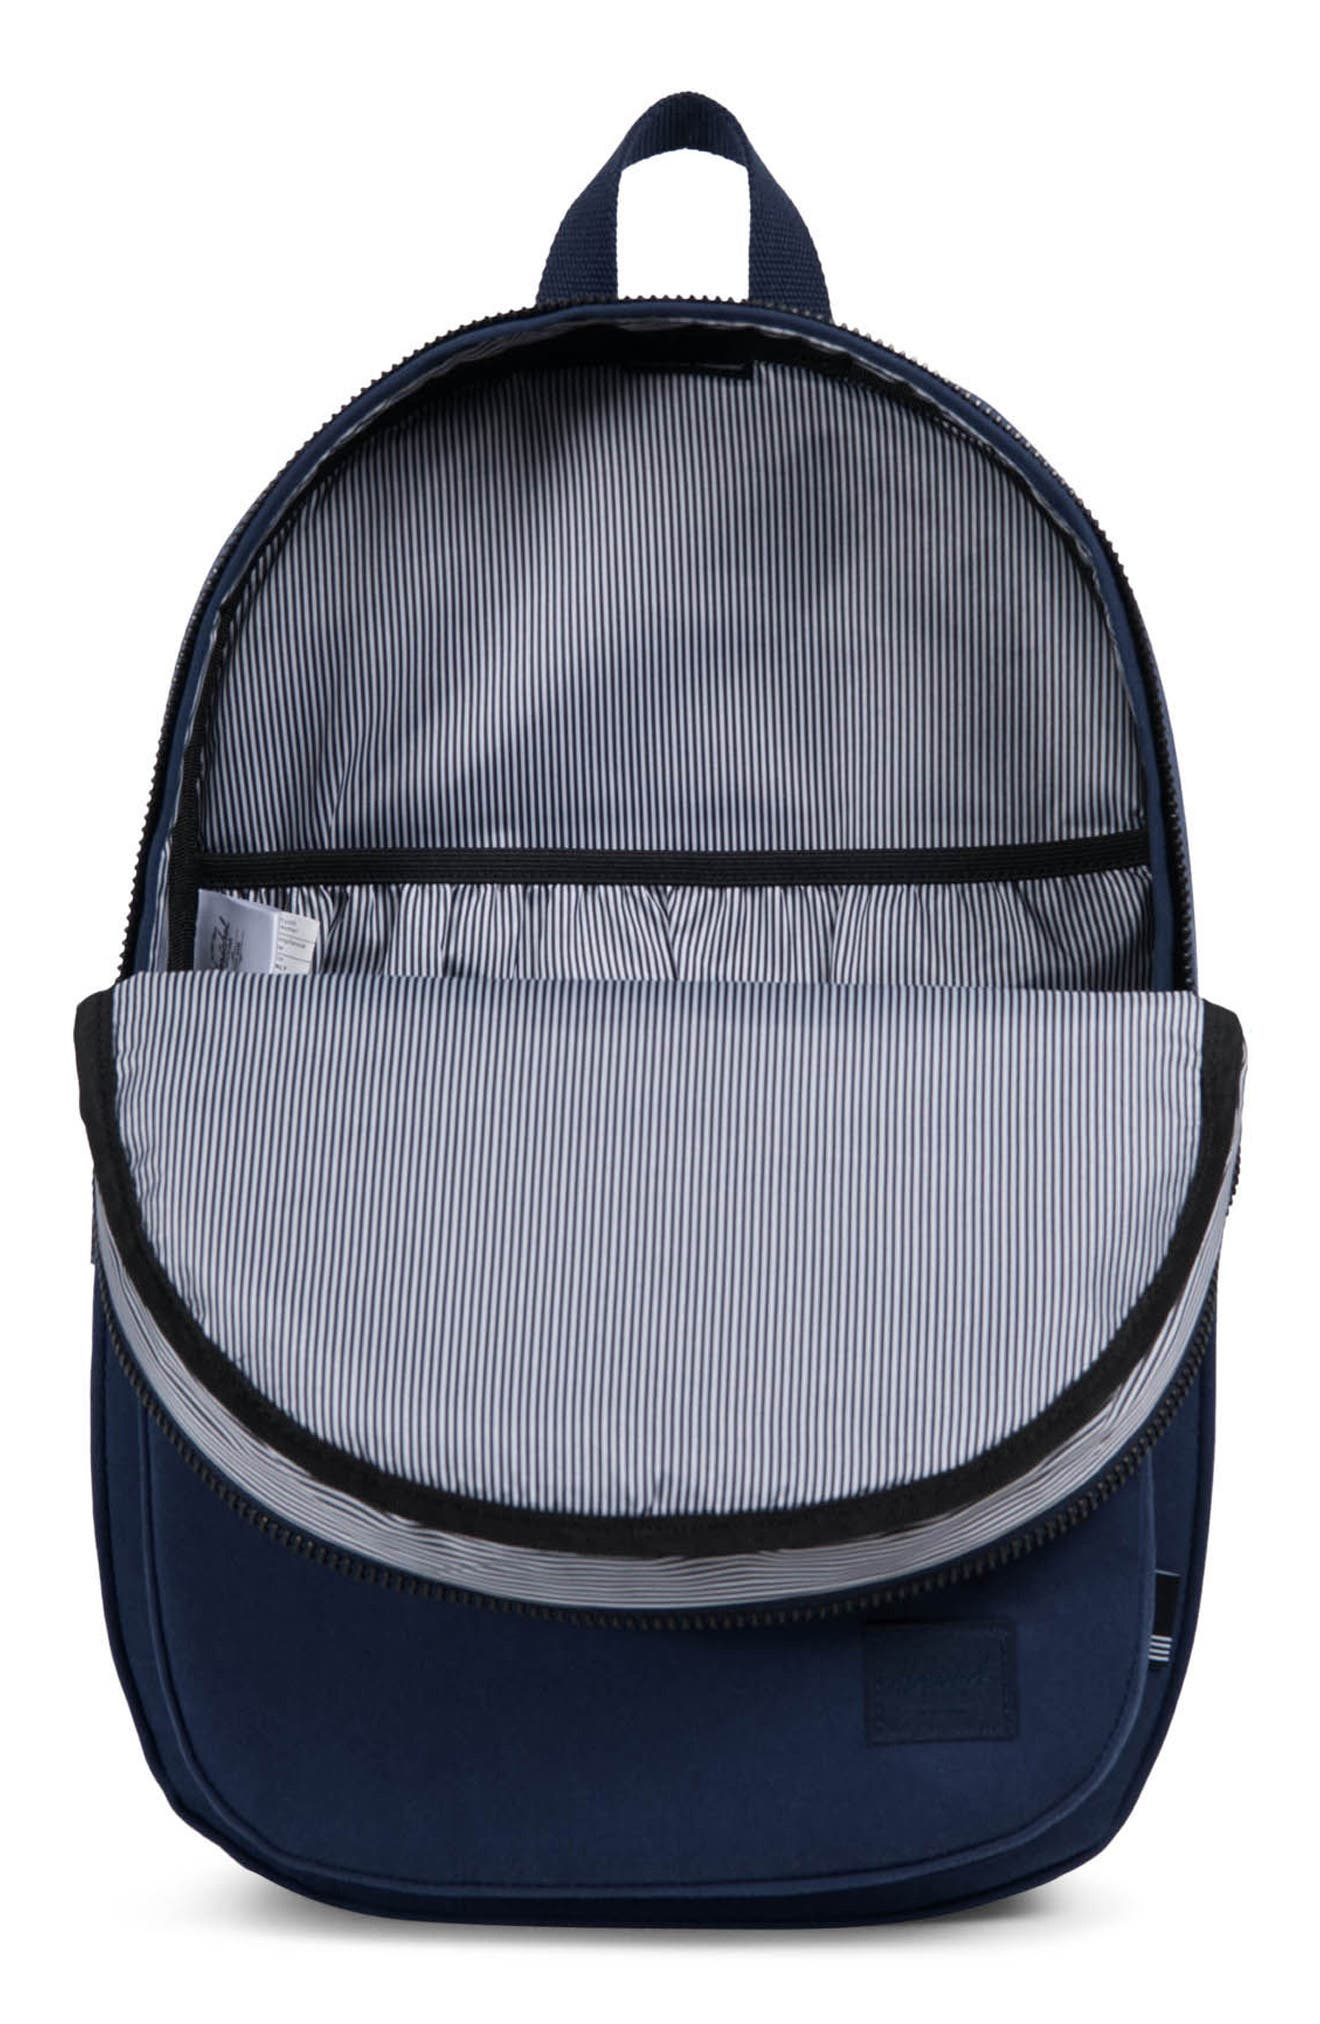 Lawson Backpack,                             Alternate thumbnail 6, color,